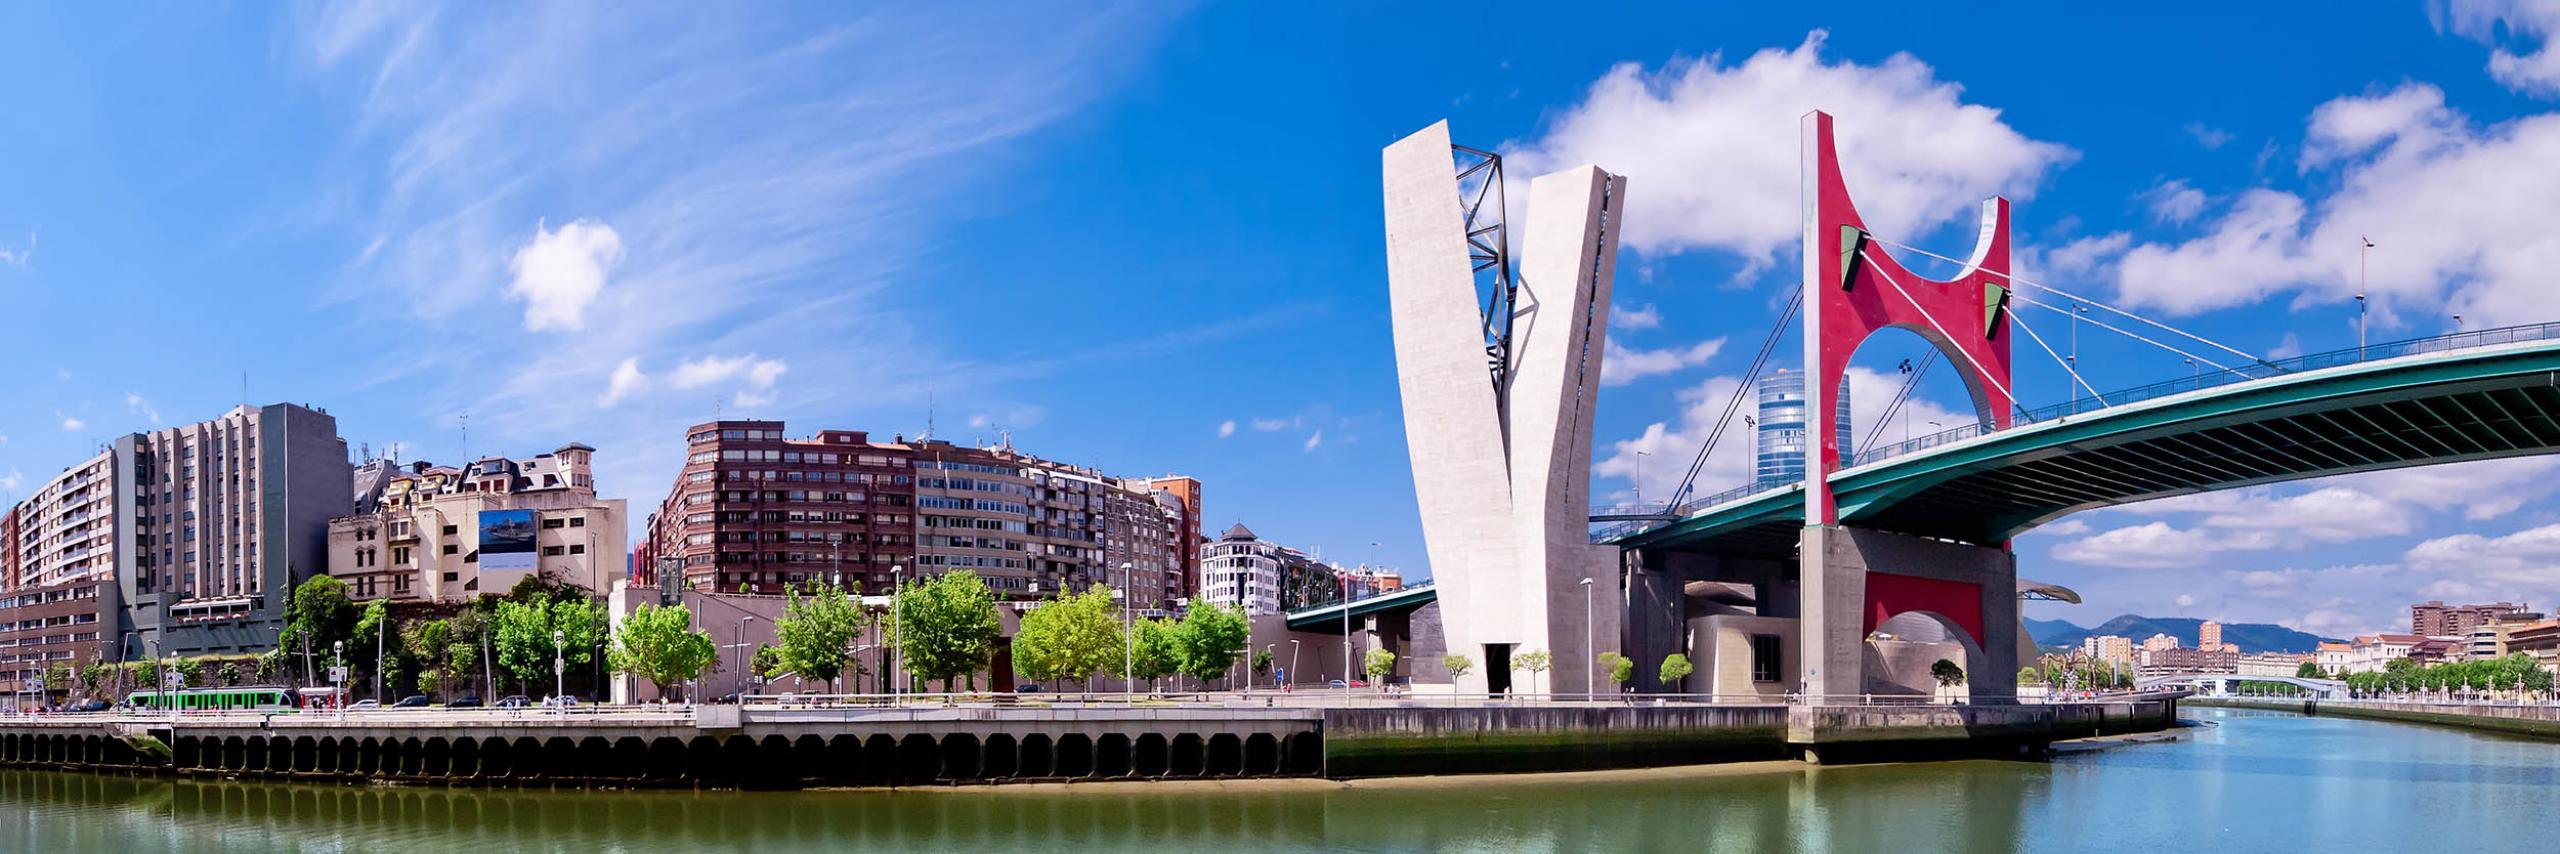 Internorte-Intercentro Bilbao